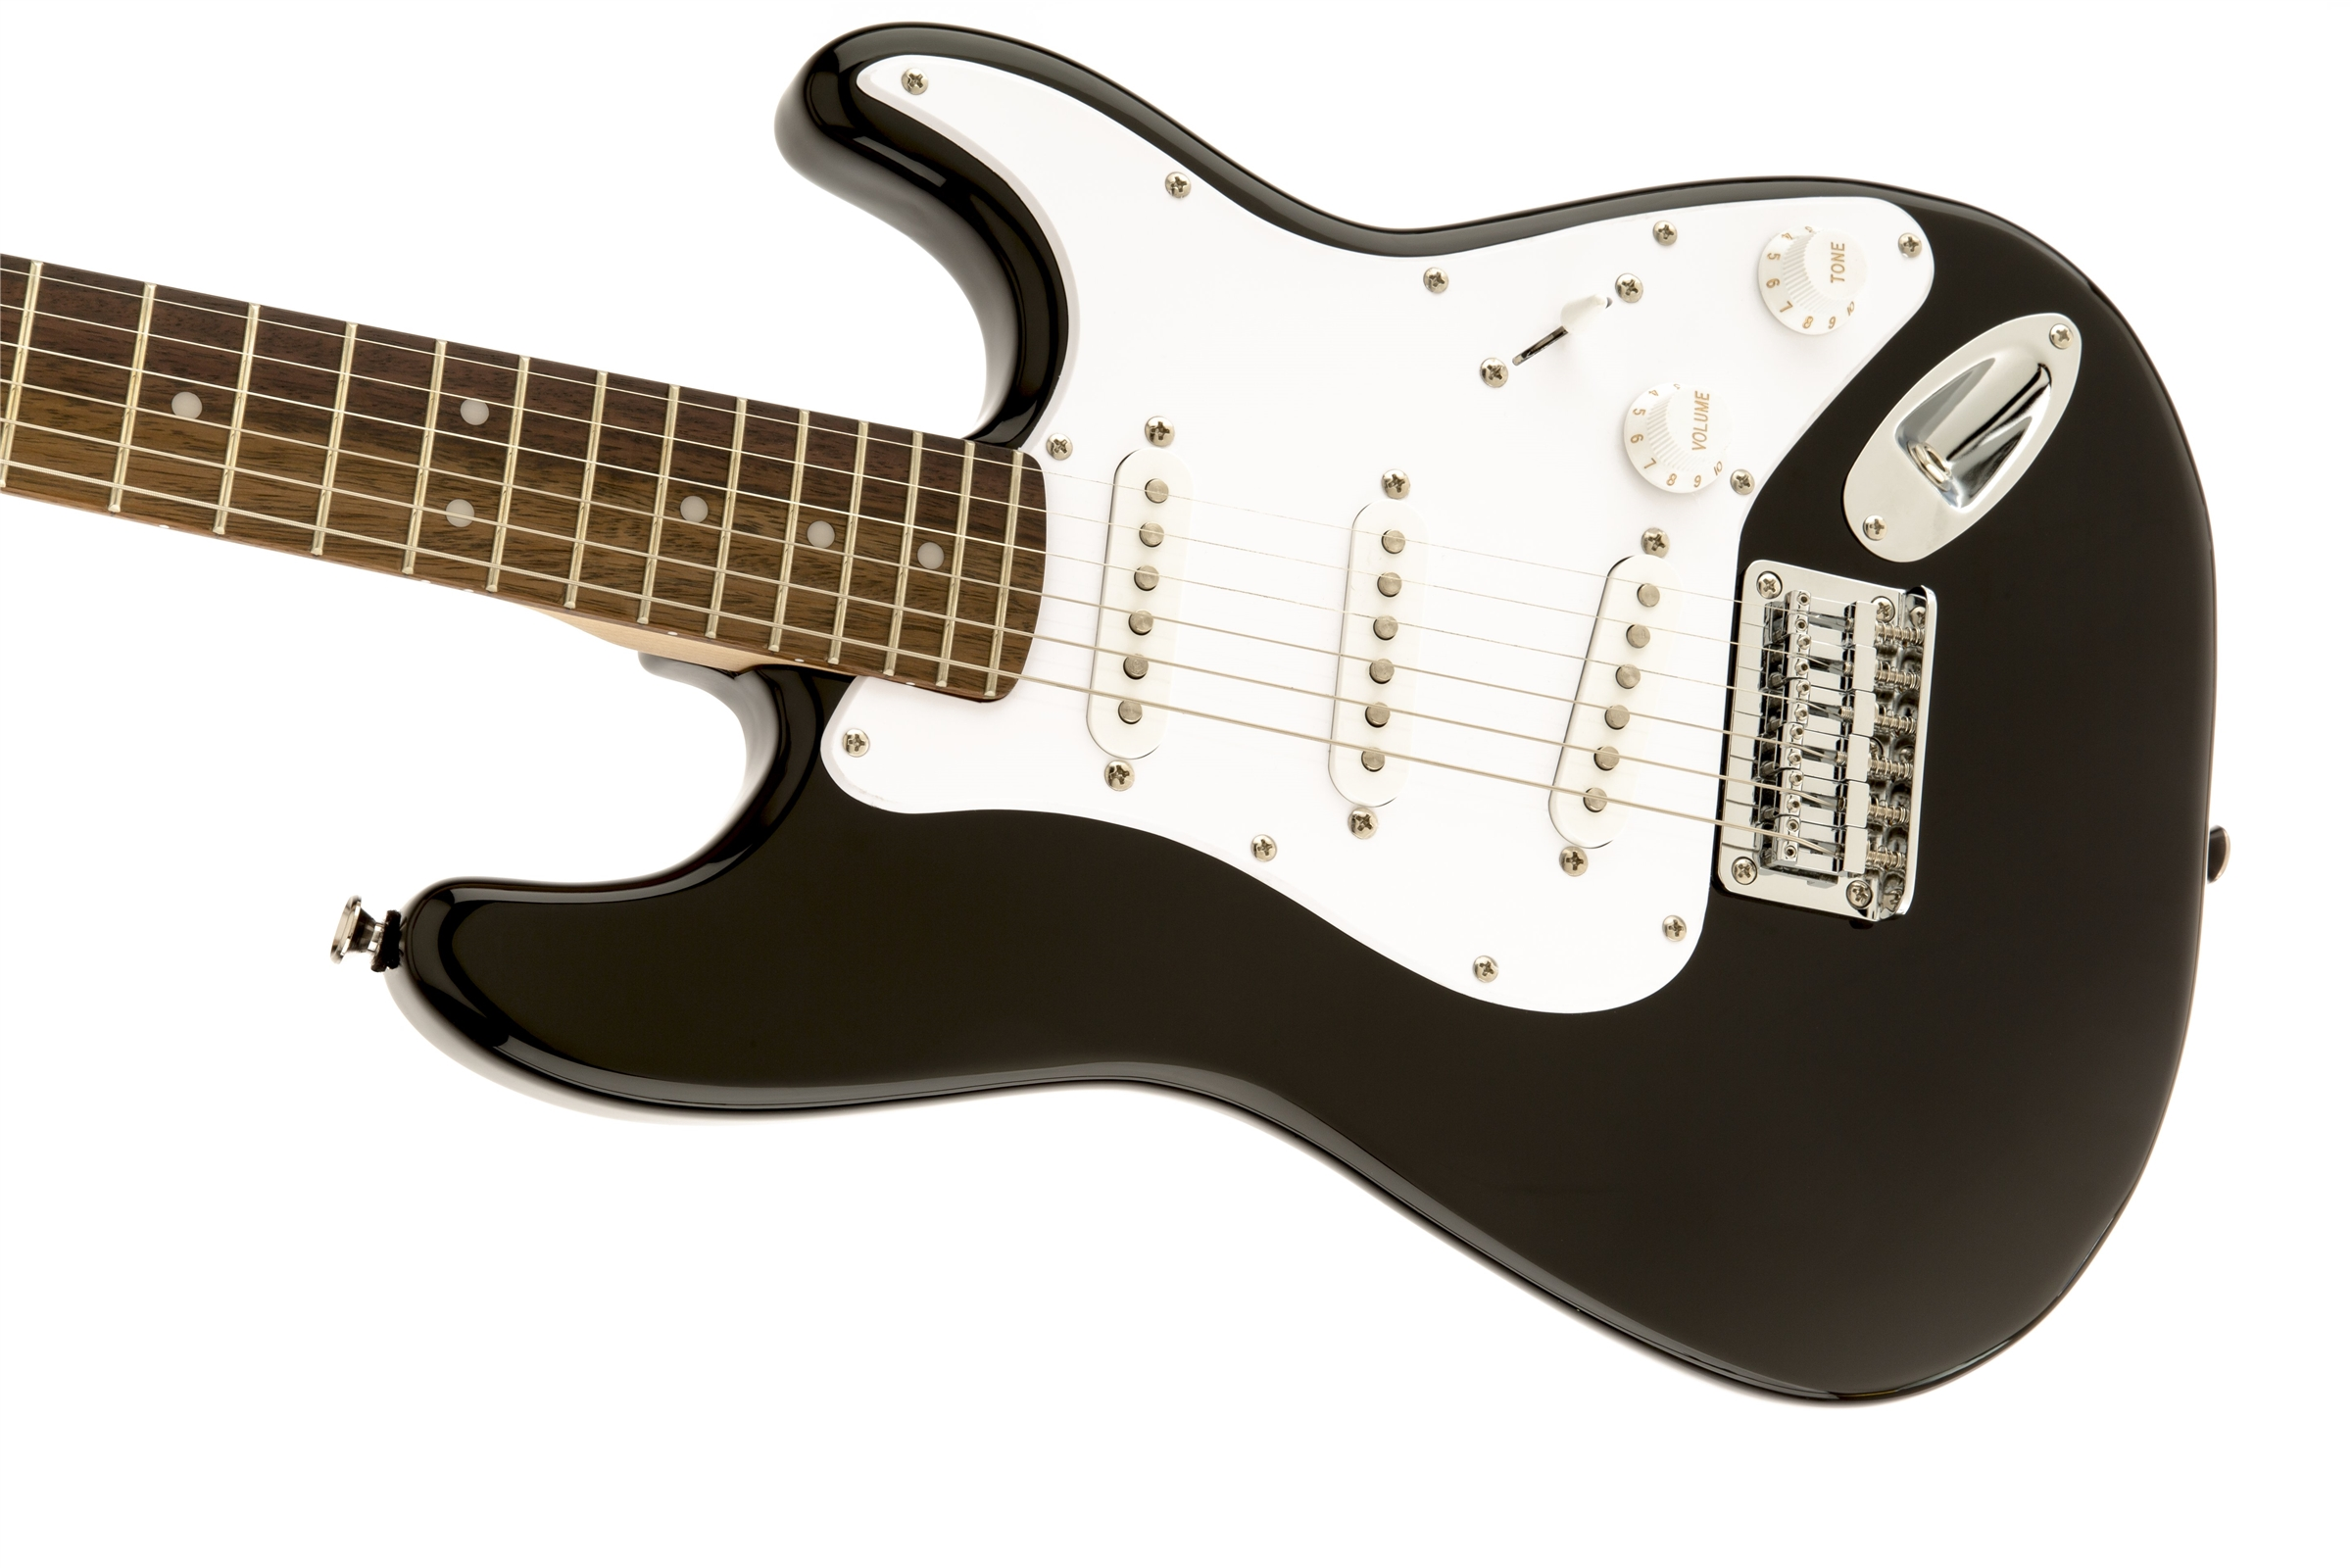 squier by fender mini strat electric guitar black w tuner 717669176846 ebay. Black Bedroom Furniture Sets. Home Design Ideas